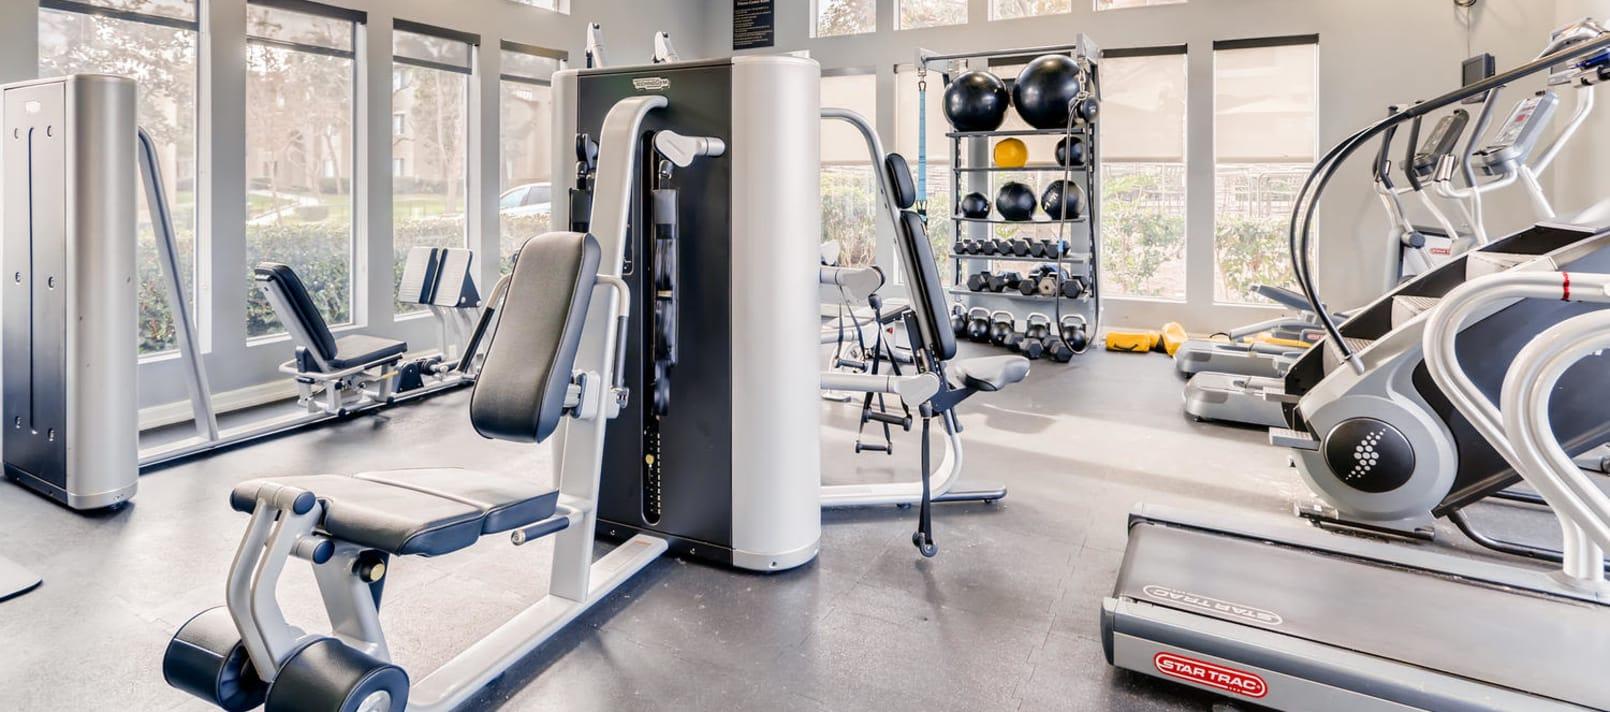 24 Hour Fitness Center in Alize at Aliso Viejo Apartment Homes in Aliso Viejo, California